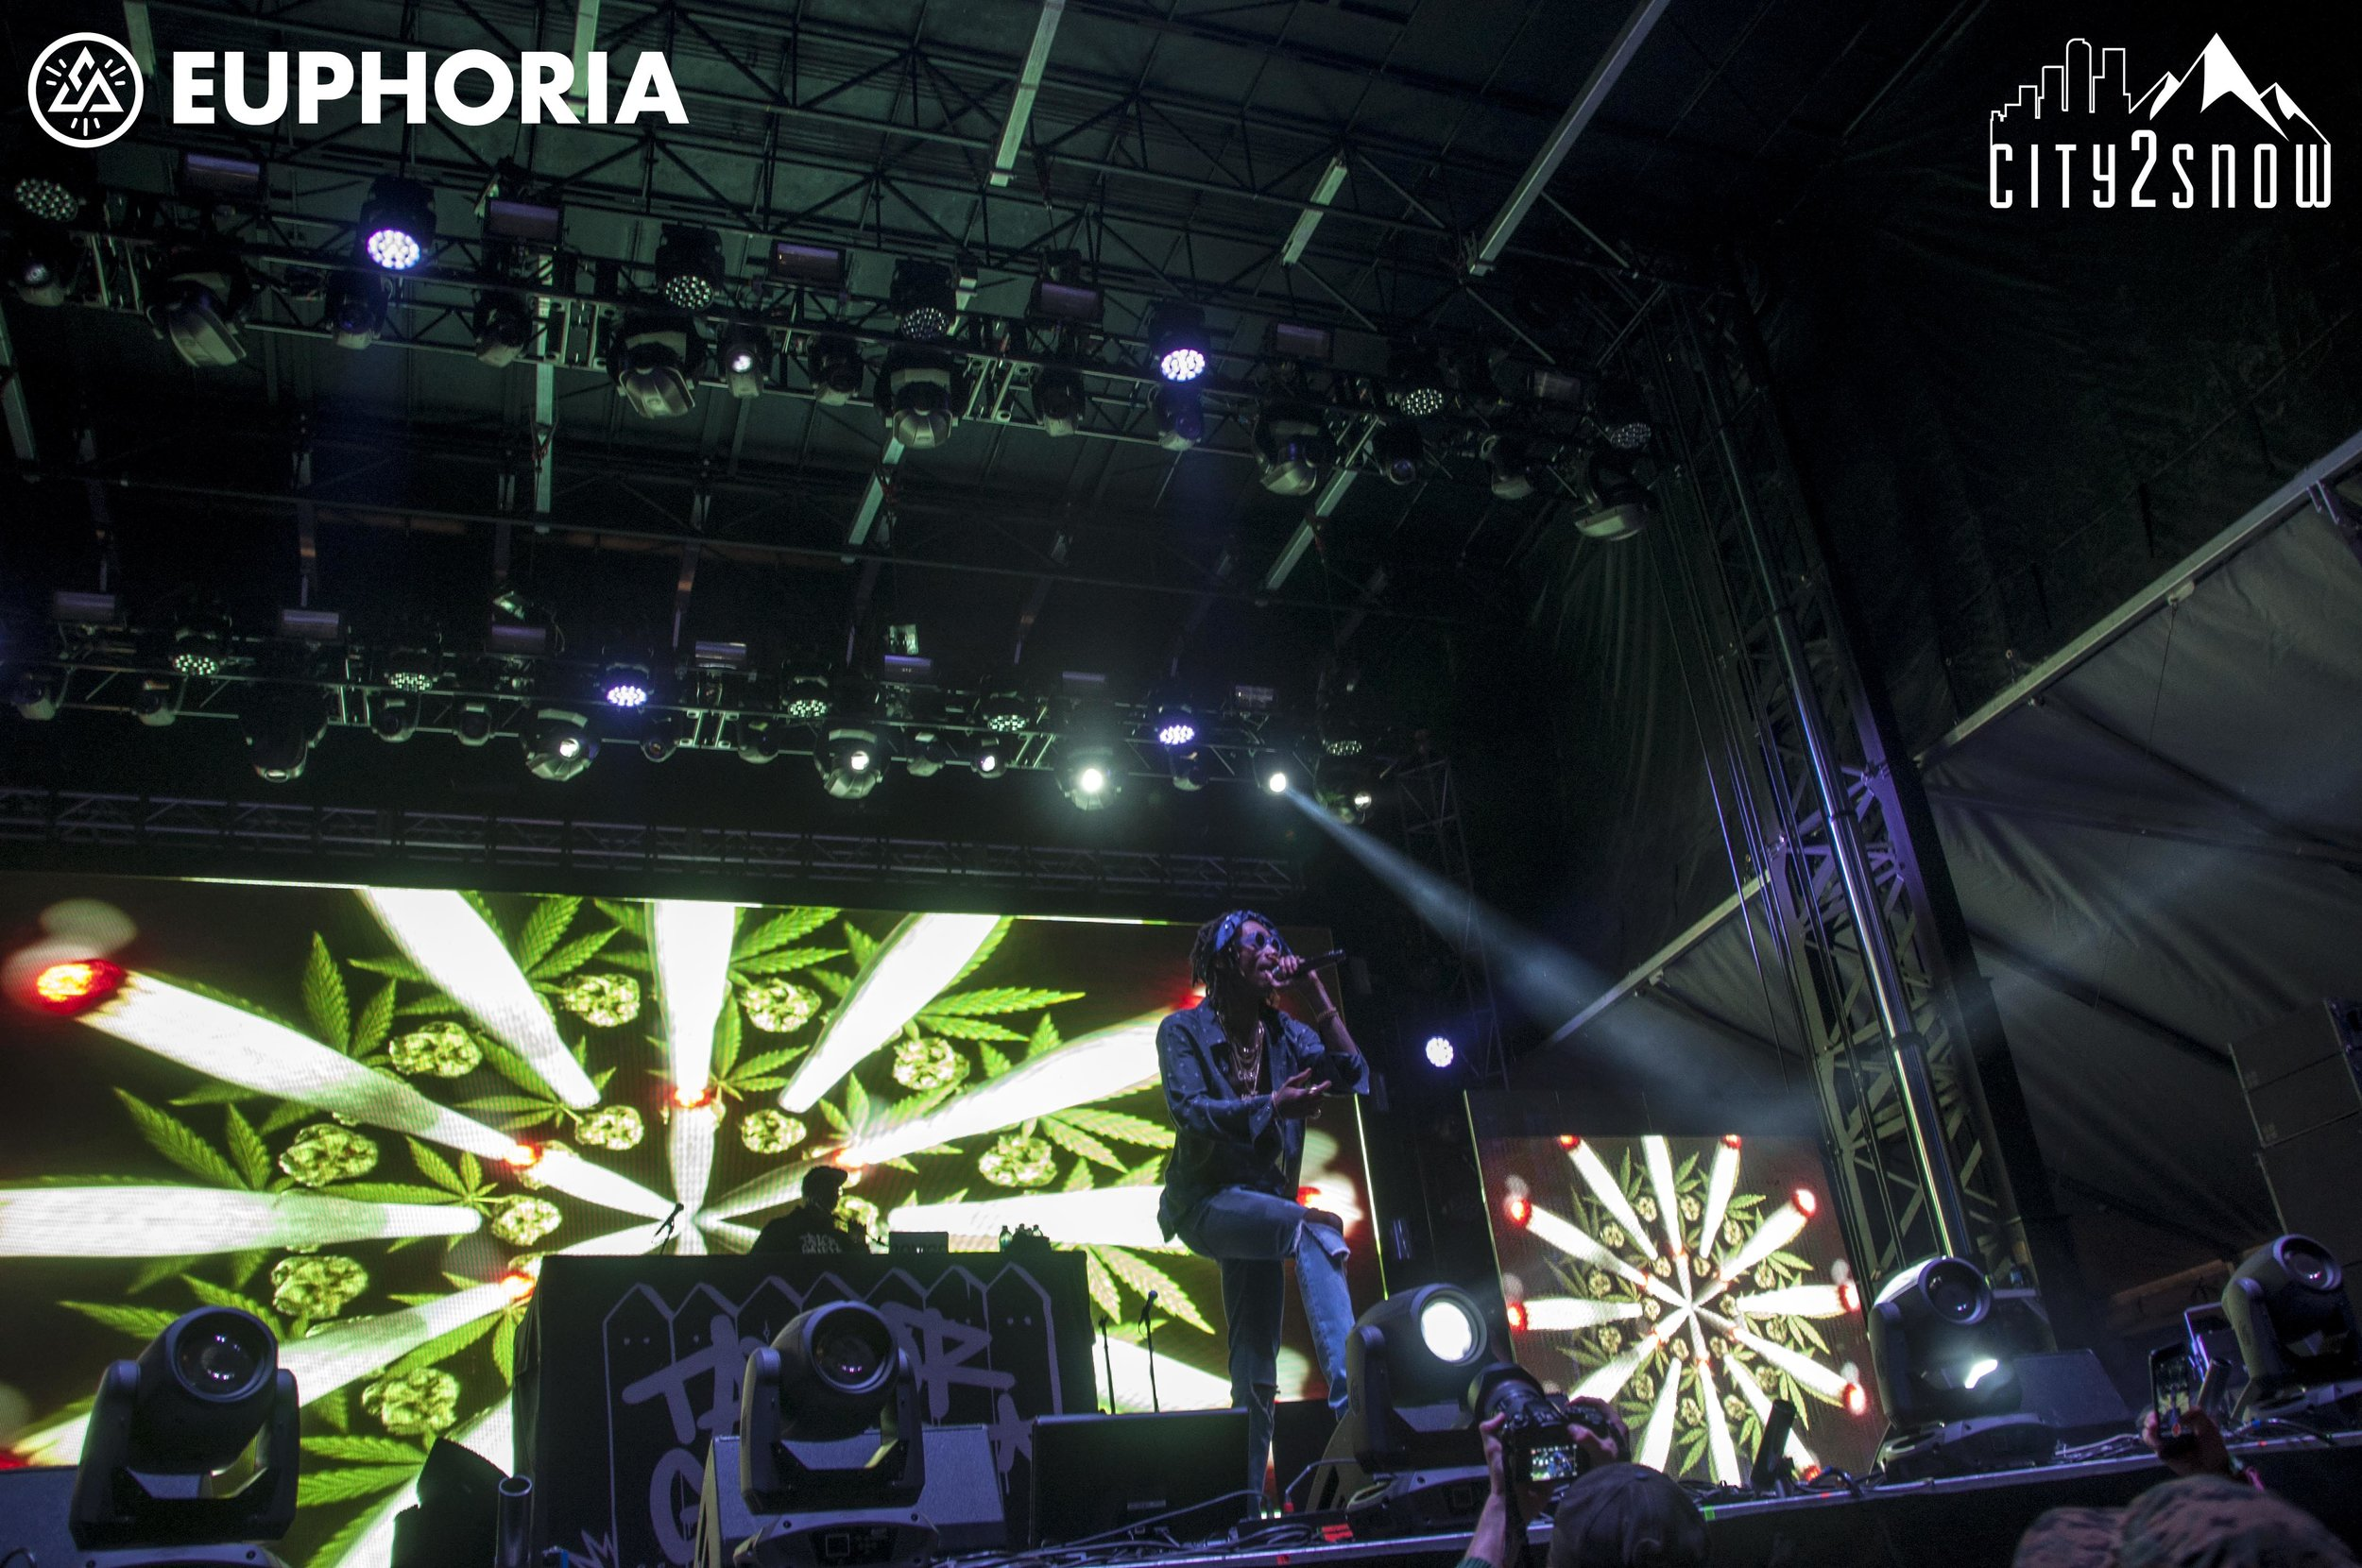 Euphoria-Music-Festival-2017-13.jpg